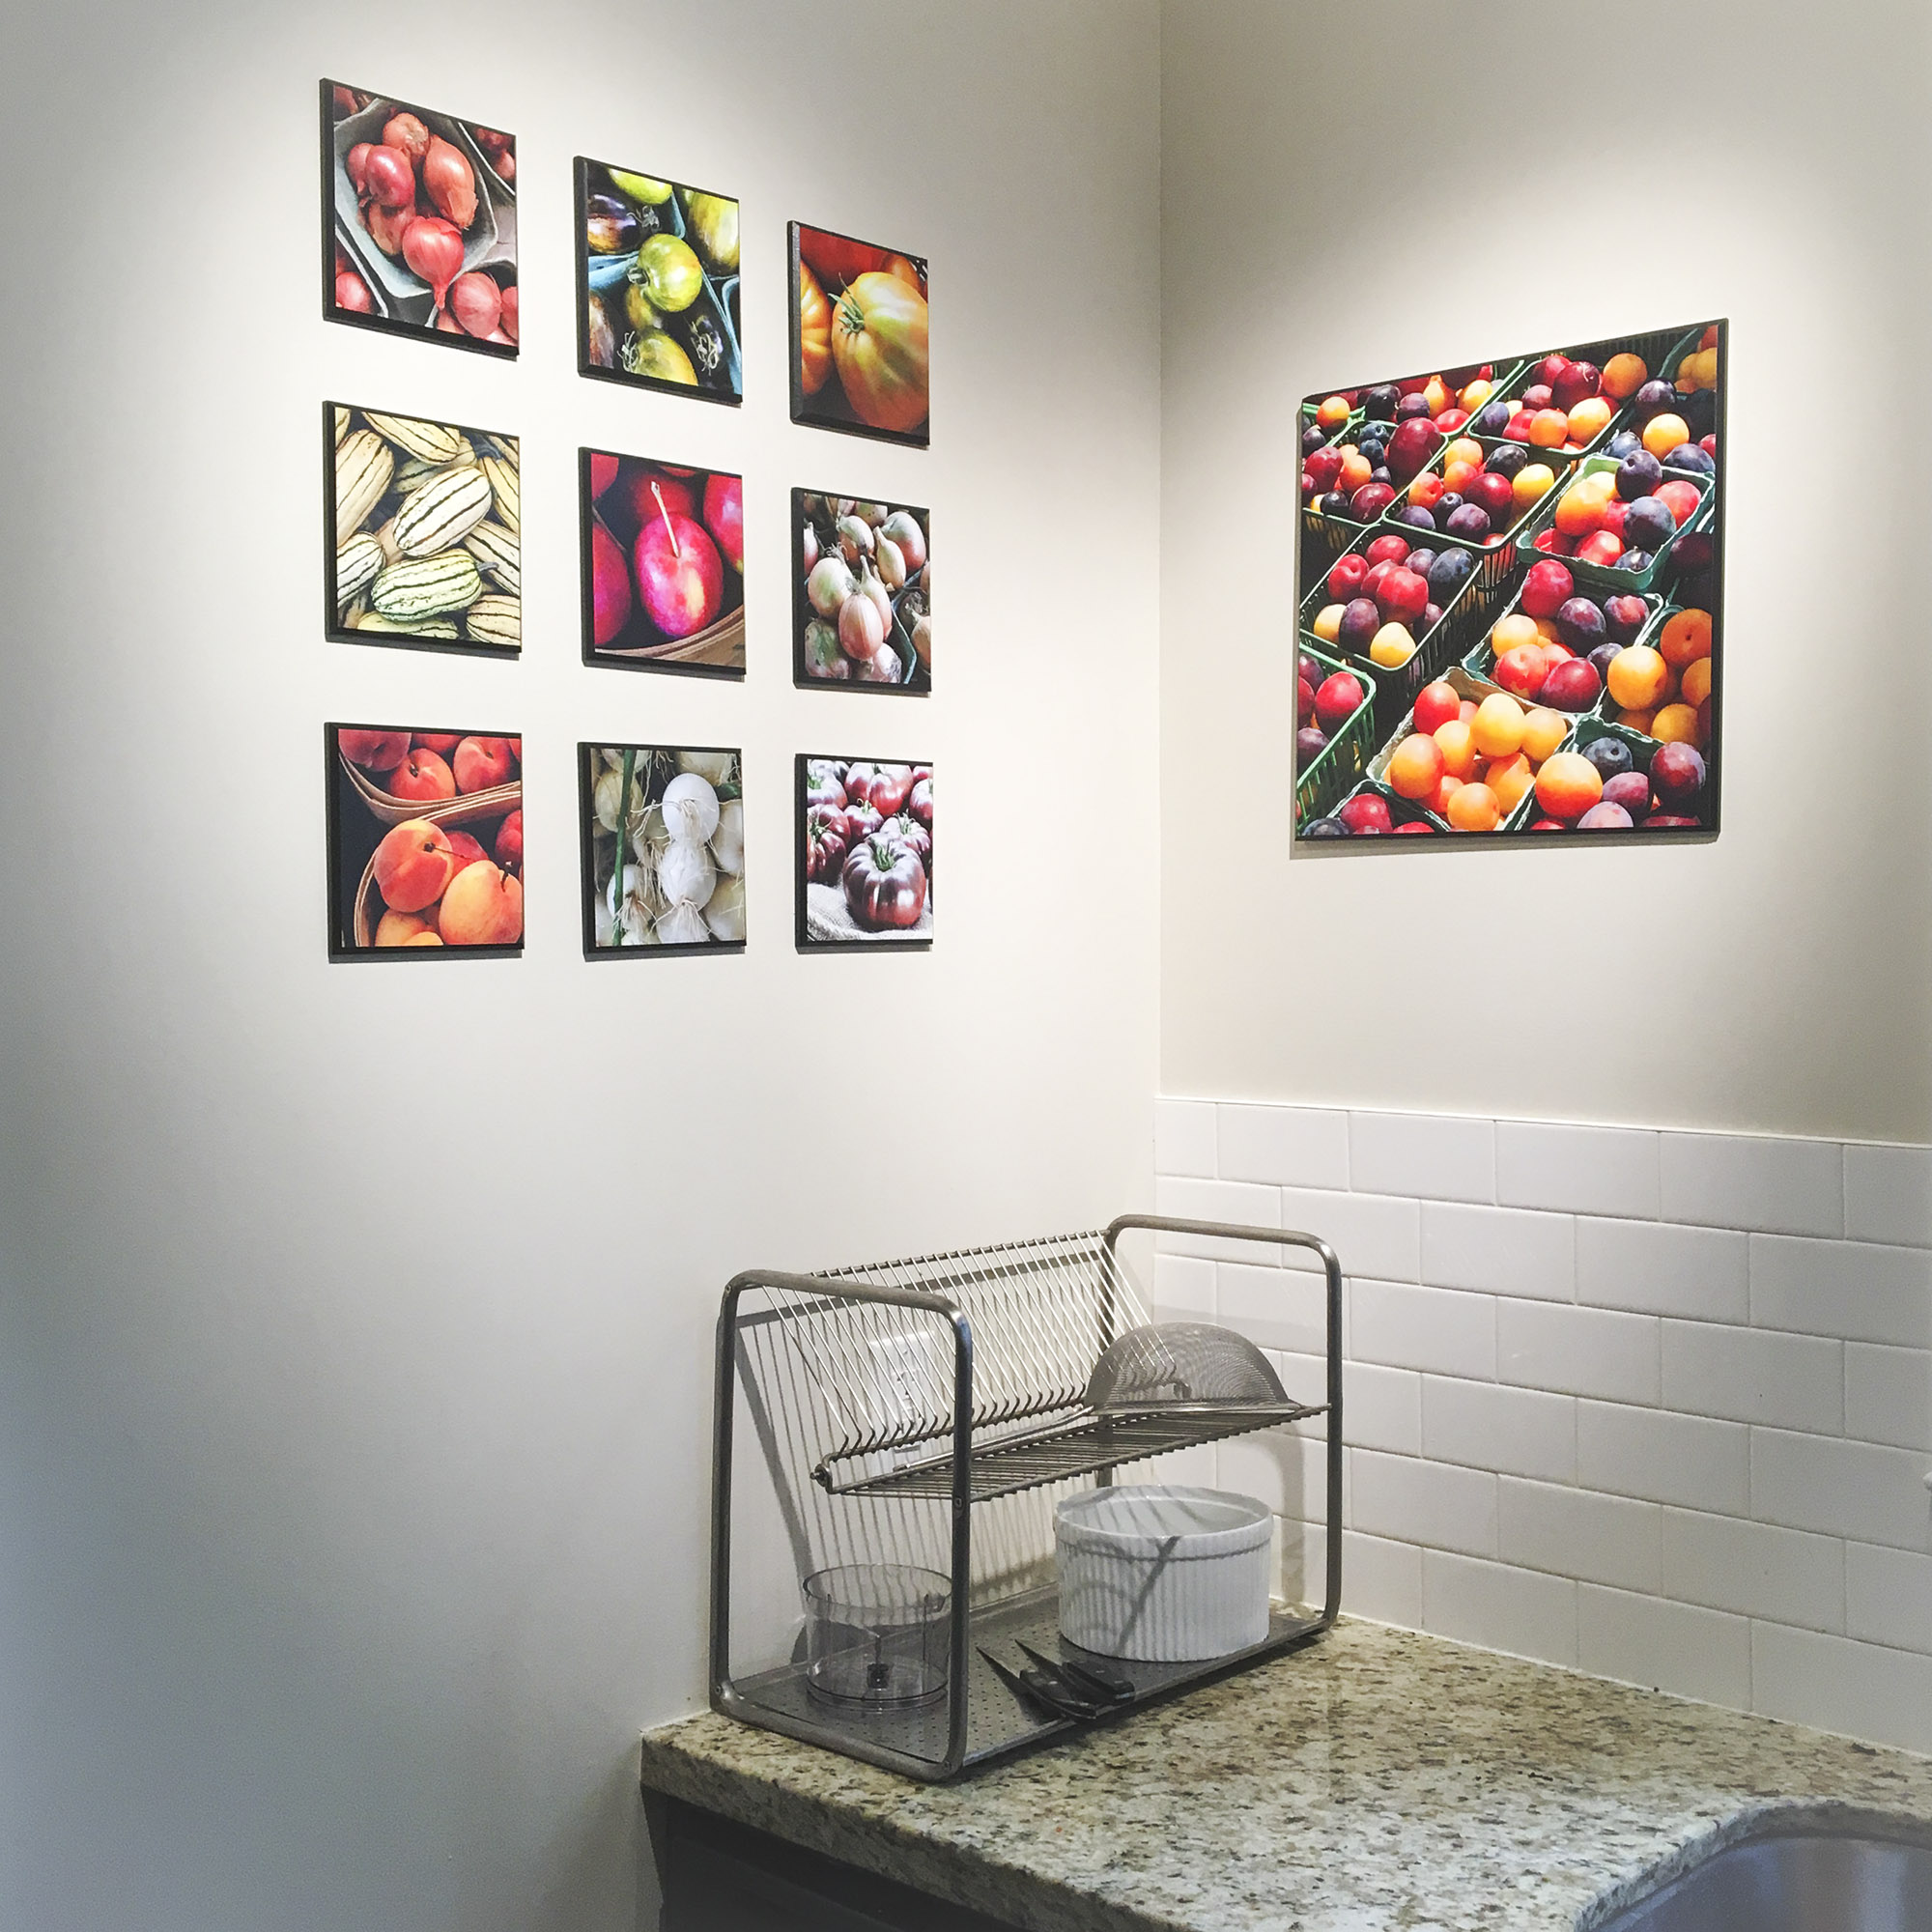 kitchen art hanging lights for island boards vegetables forward vegfwd sqsp jpg